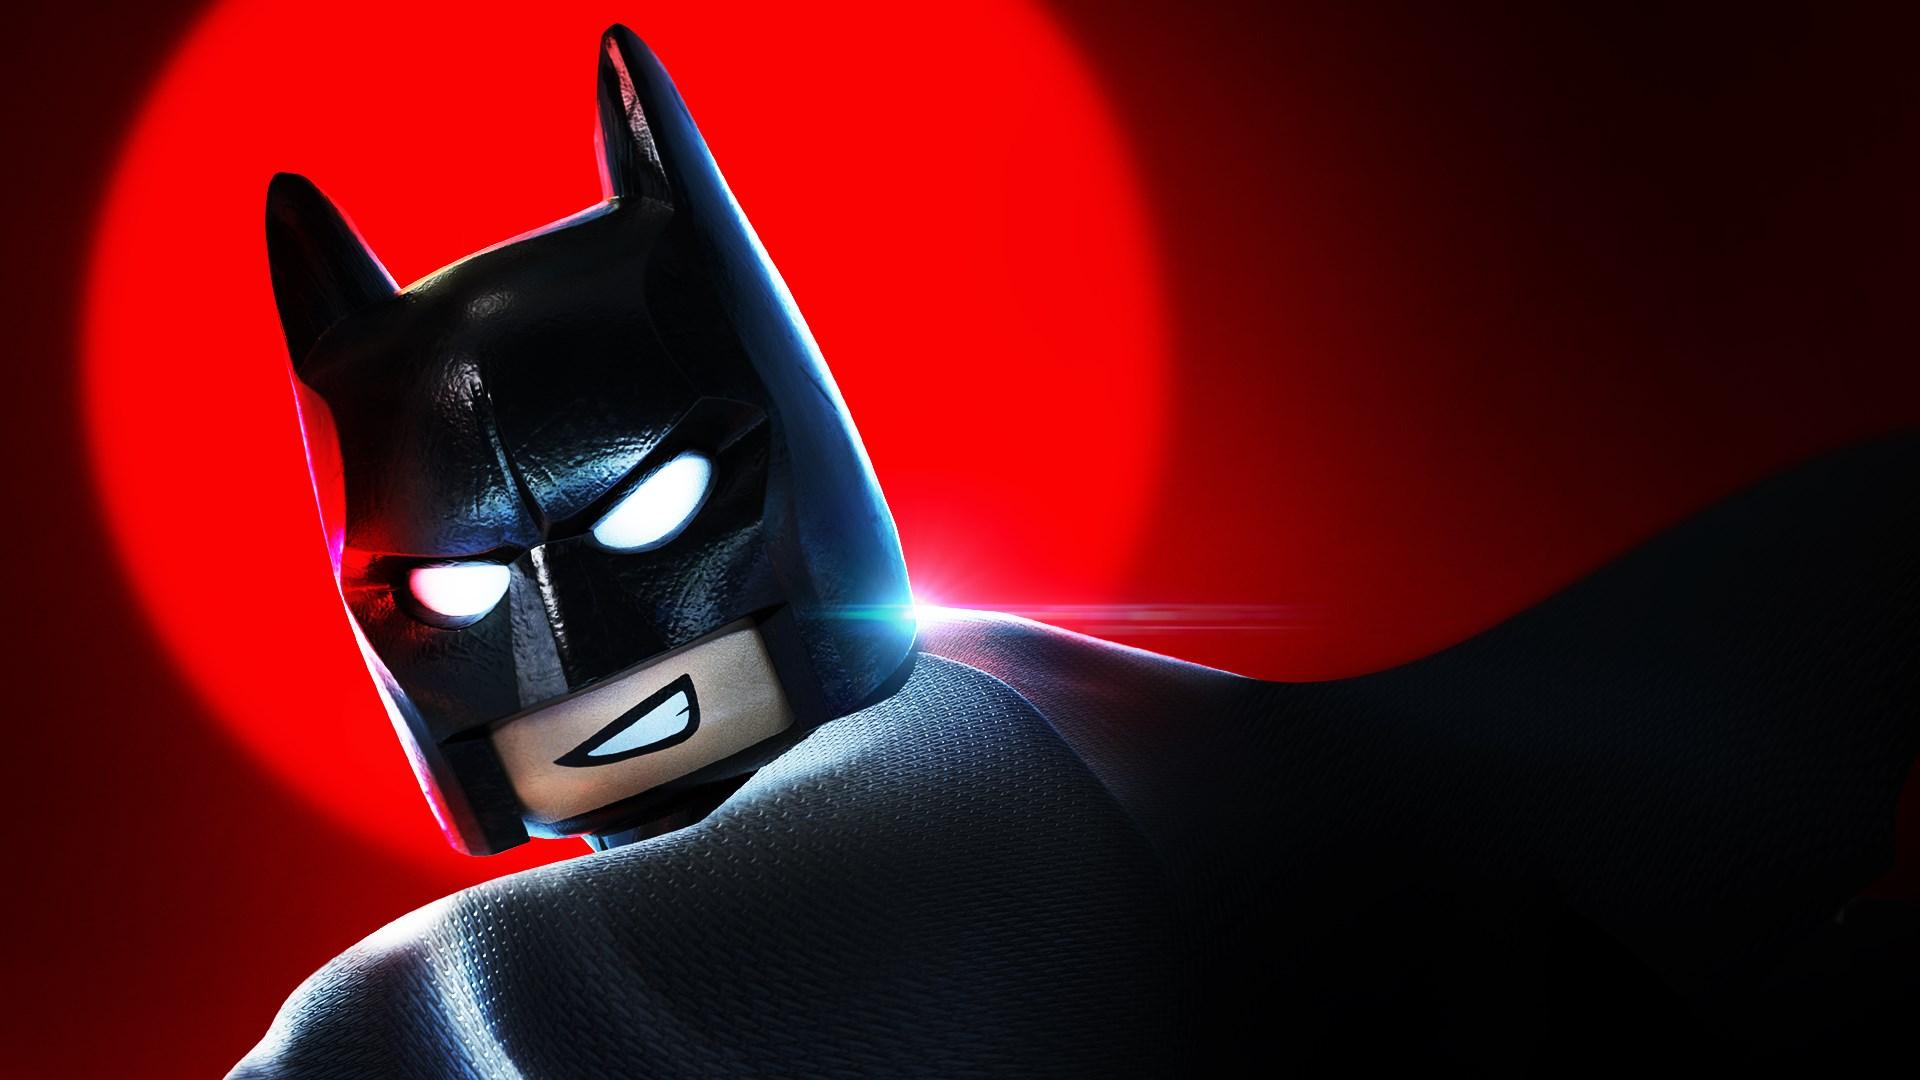 LEGO® DC Super-Villains Batman: The Animated Series Level Pack